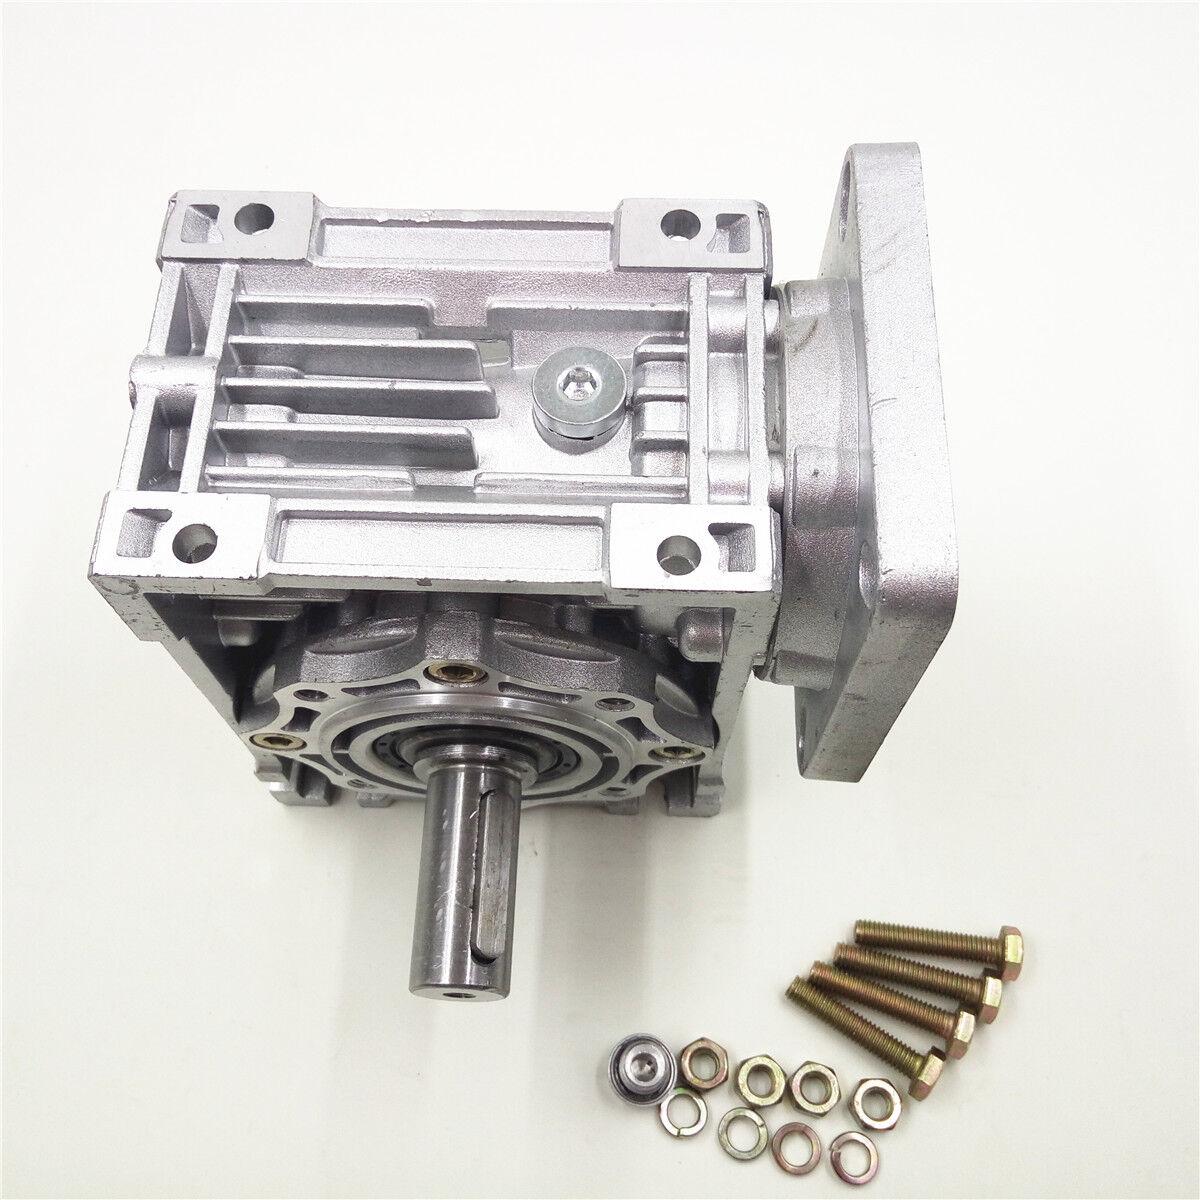 Nema34 Worm Gearbox Geared Speed Reducer 14mm Input Reduction for Stepper Motor 11